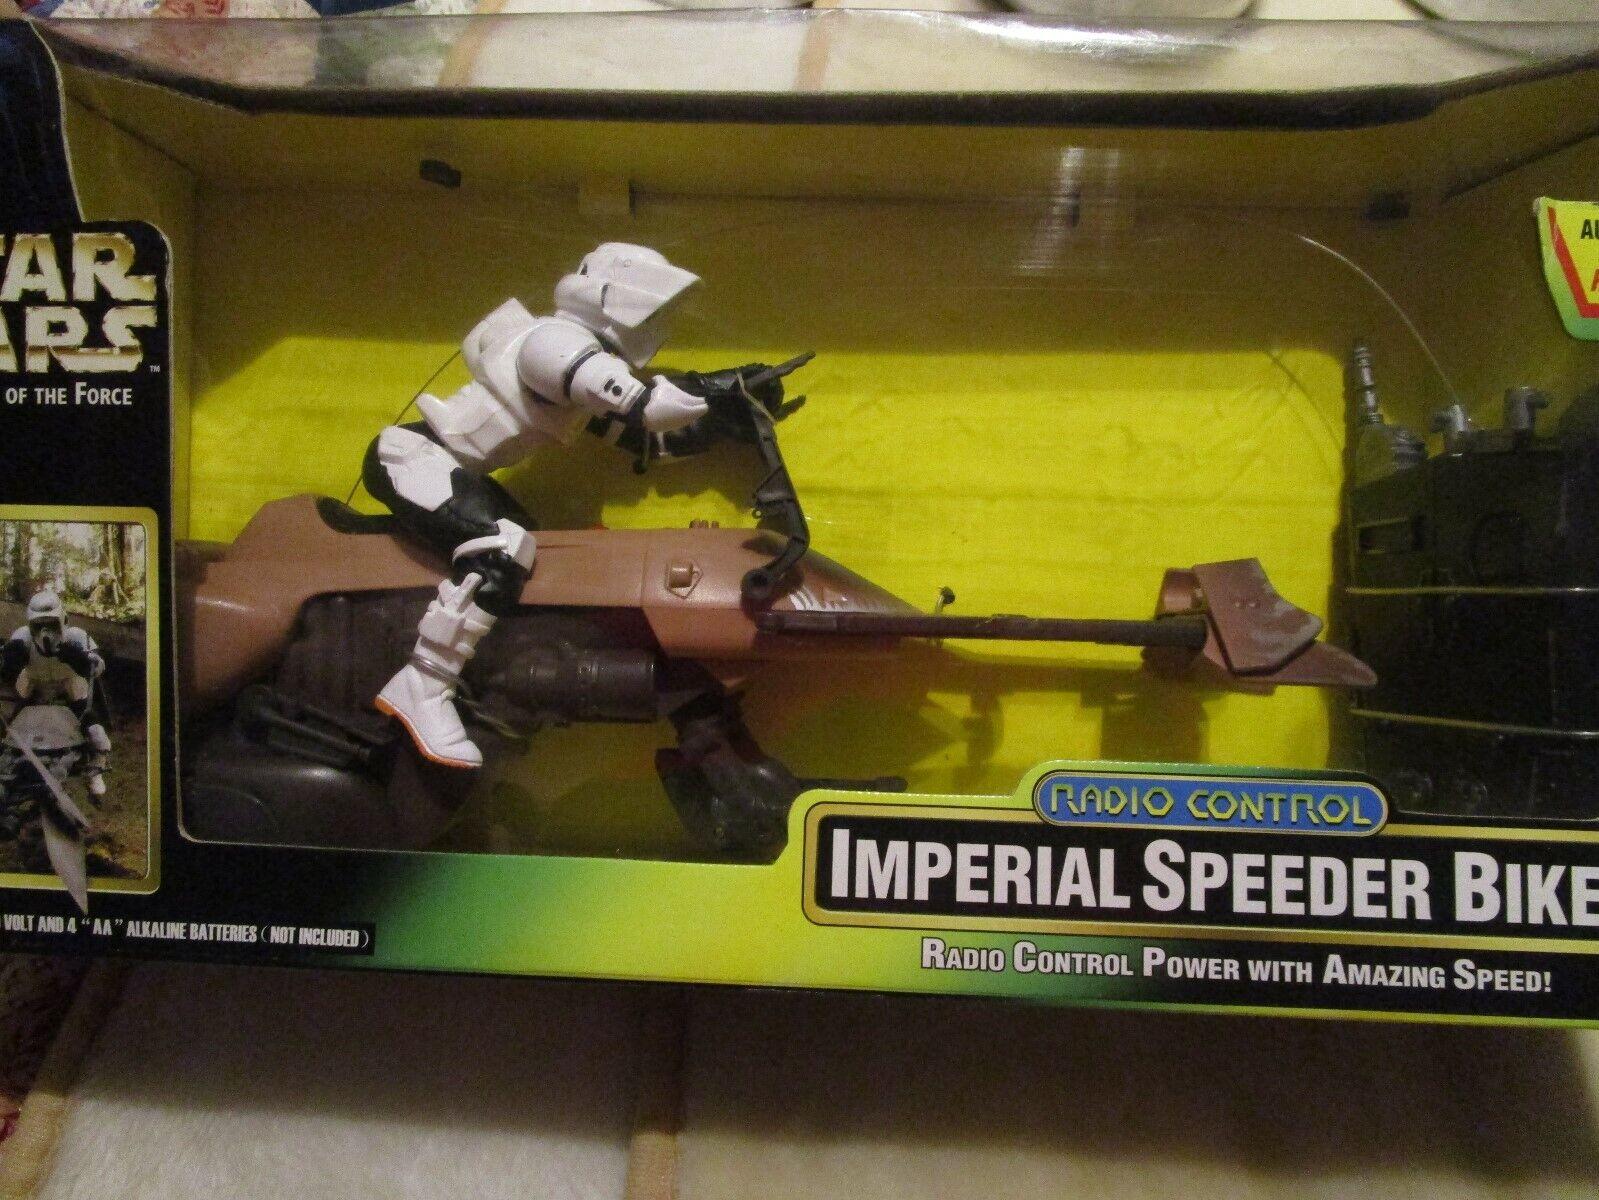 Star Wars Power Of The Force Radio Control Imperial Speeder Bike NIB